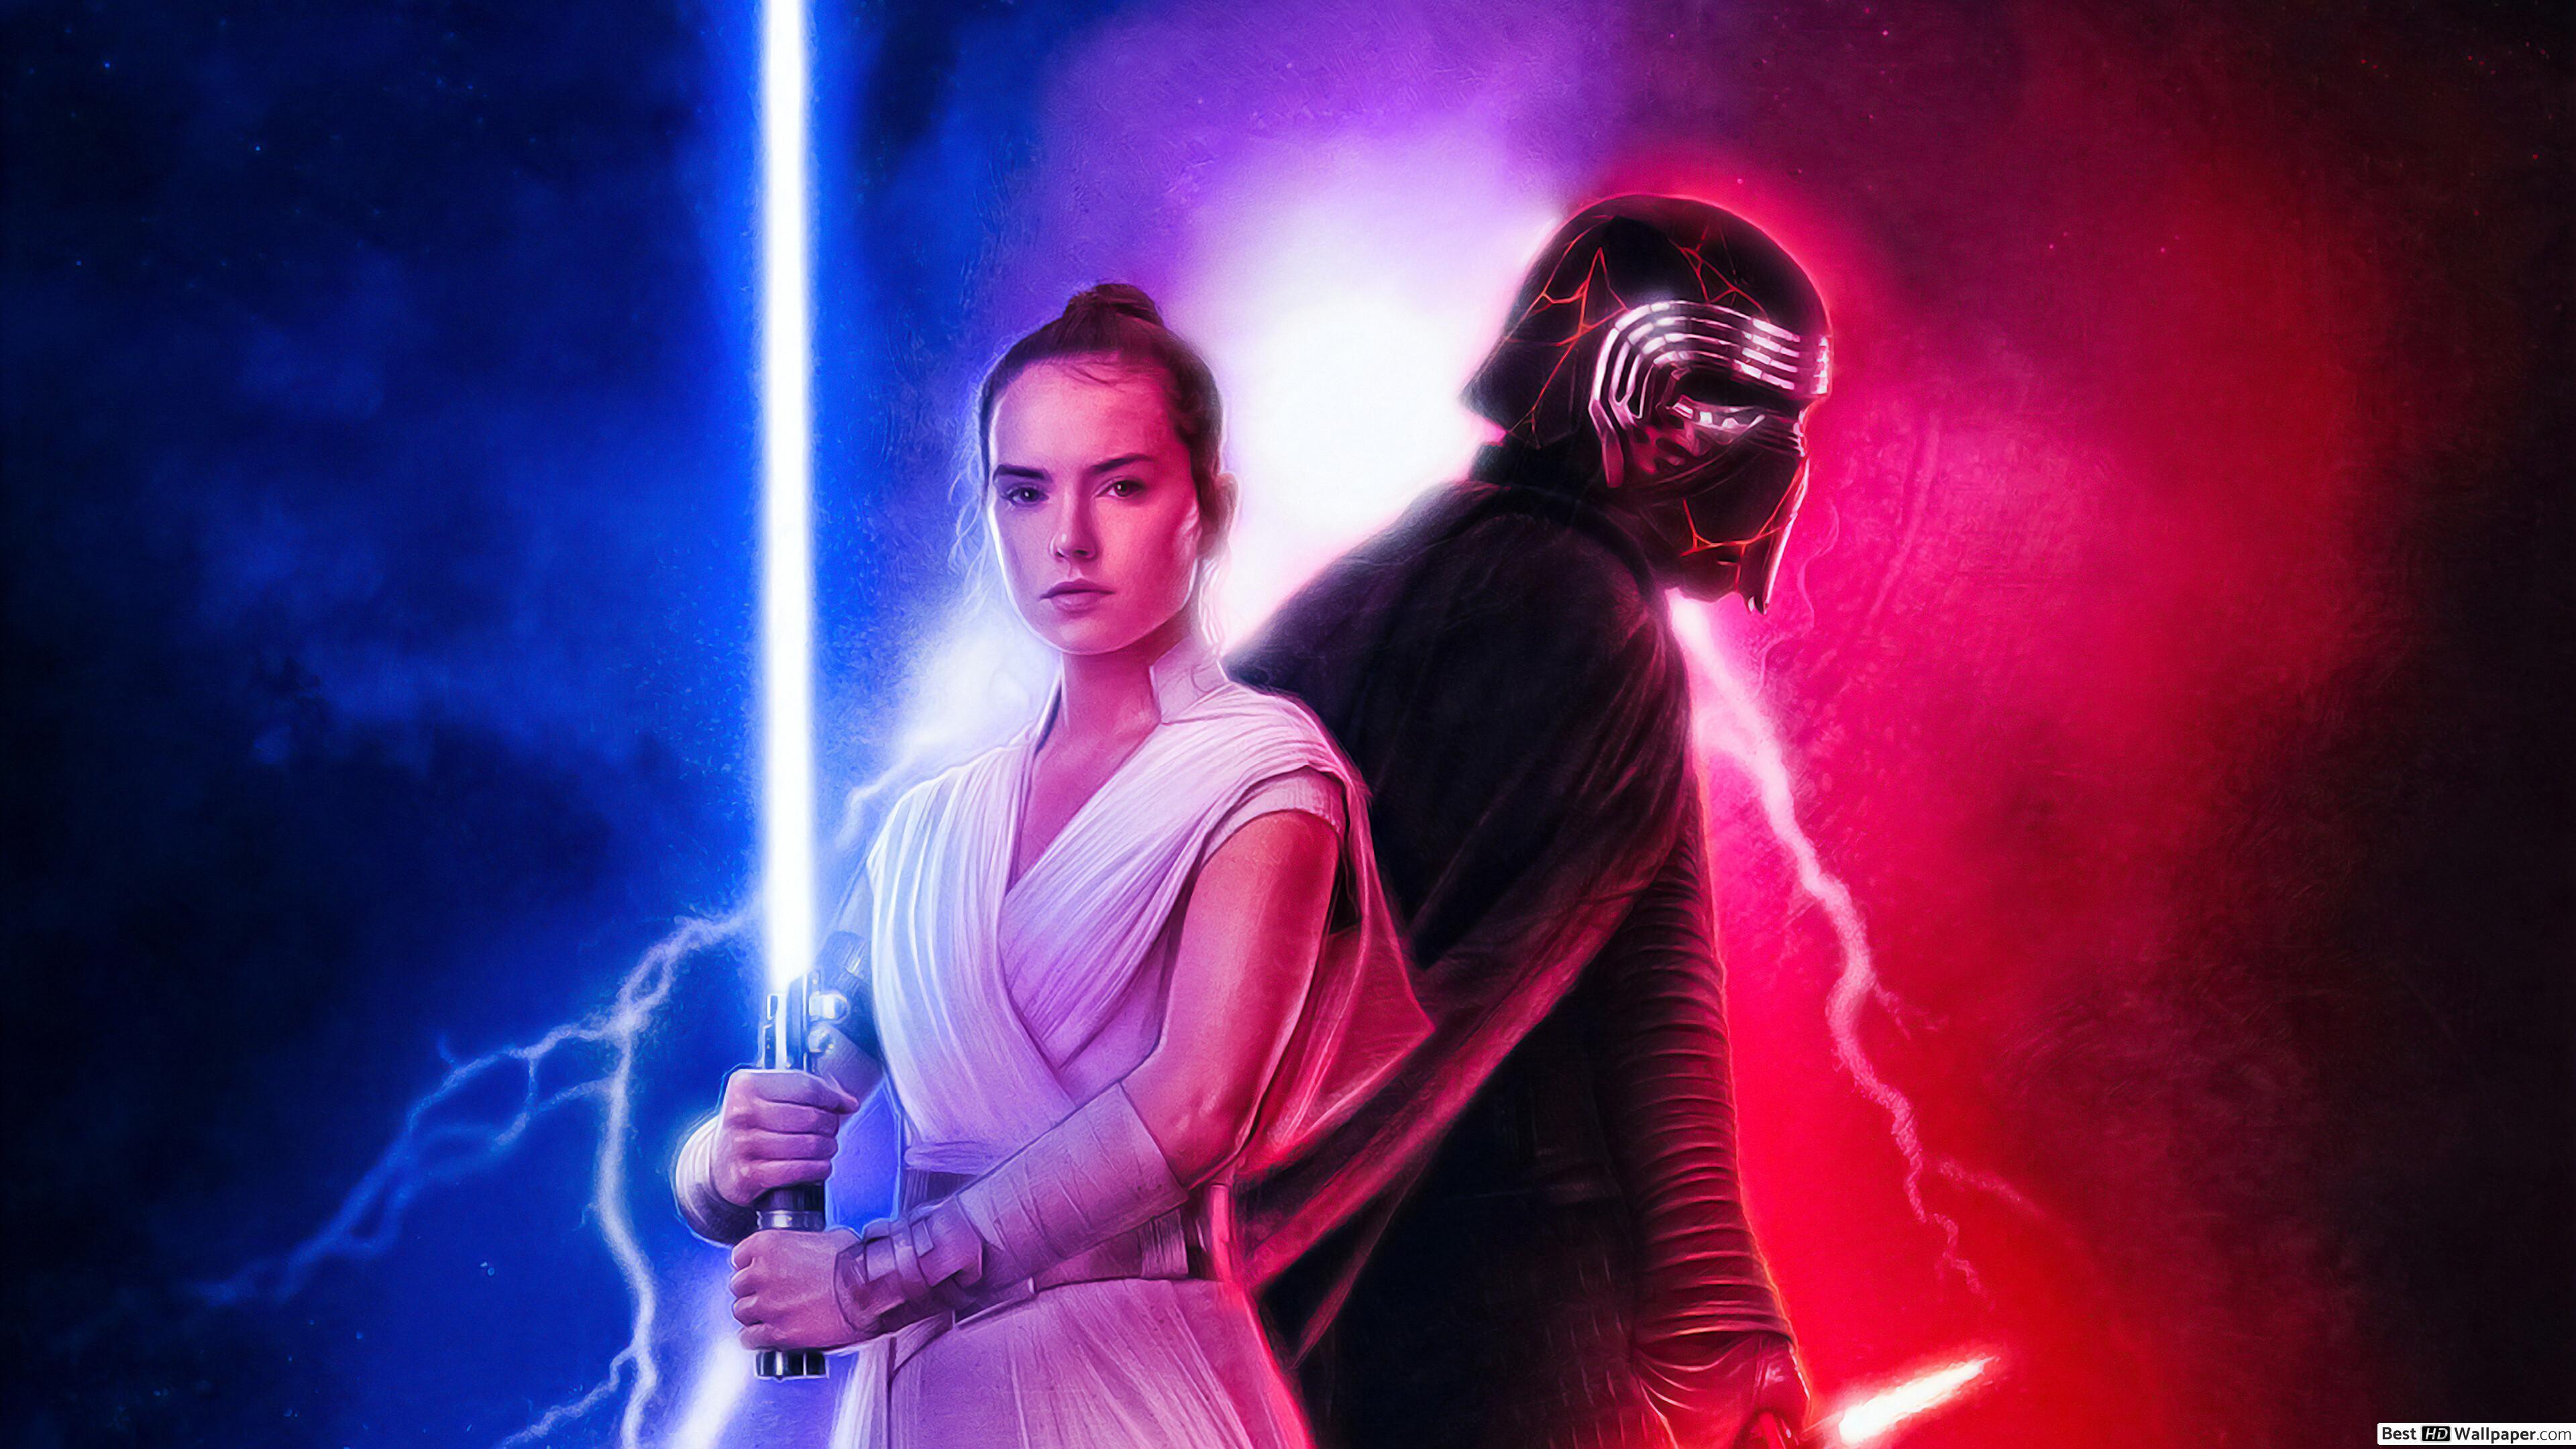 Rey Star Wars 9 , HD Wallpaper & Backgrounds